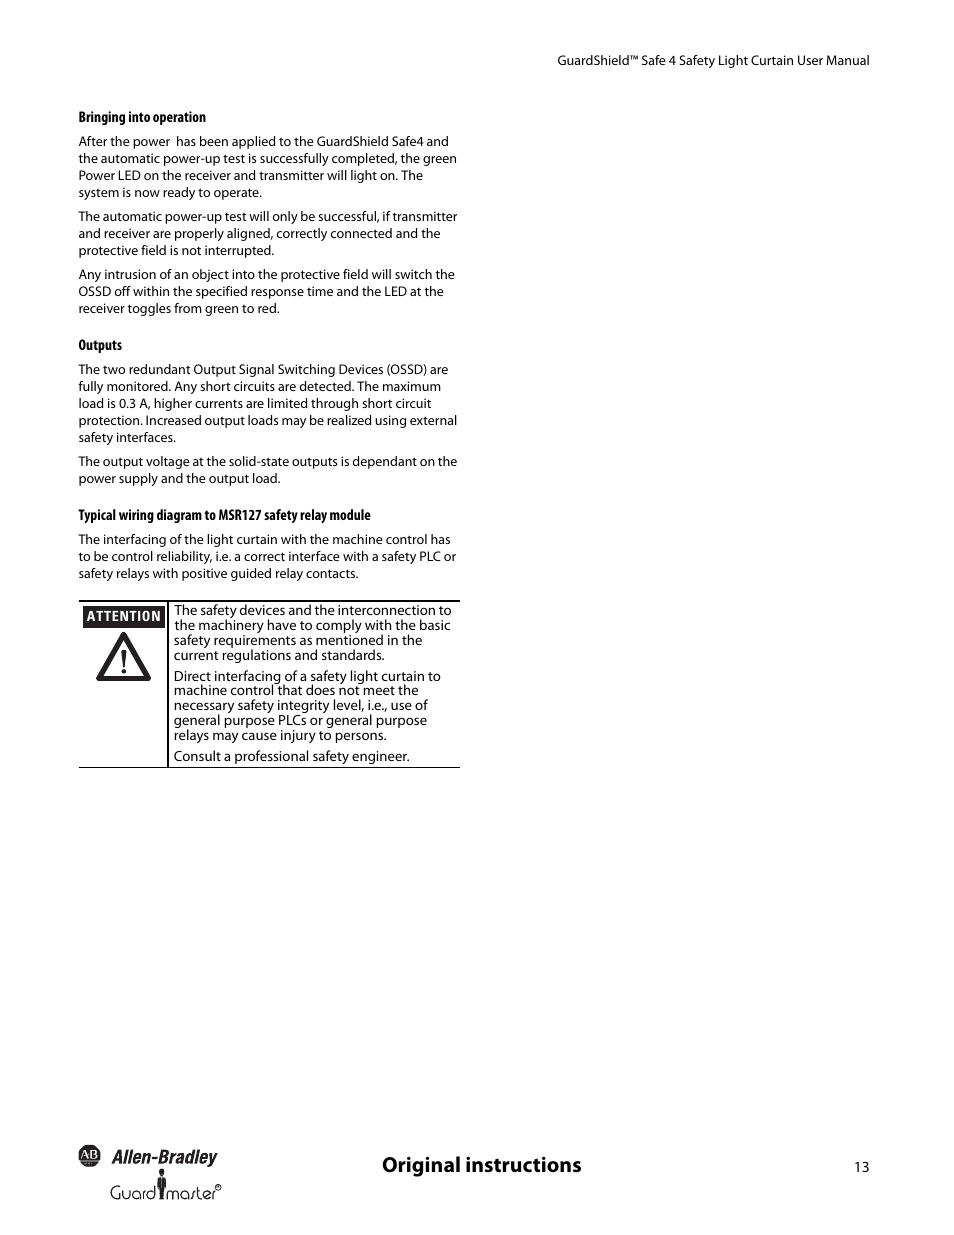 medium resolution of  original instructions rockwell automation 445l guardshield safe 4 on buzzer wiring diagram